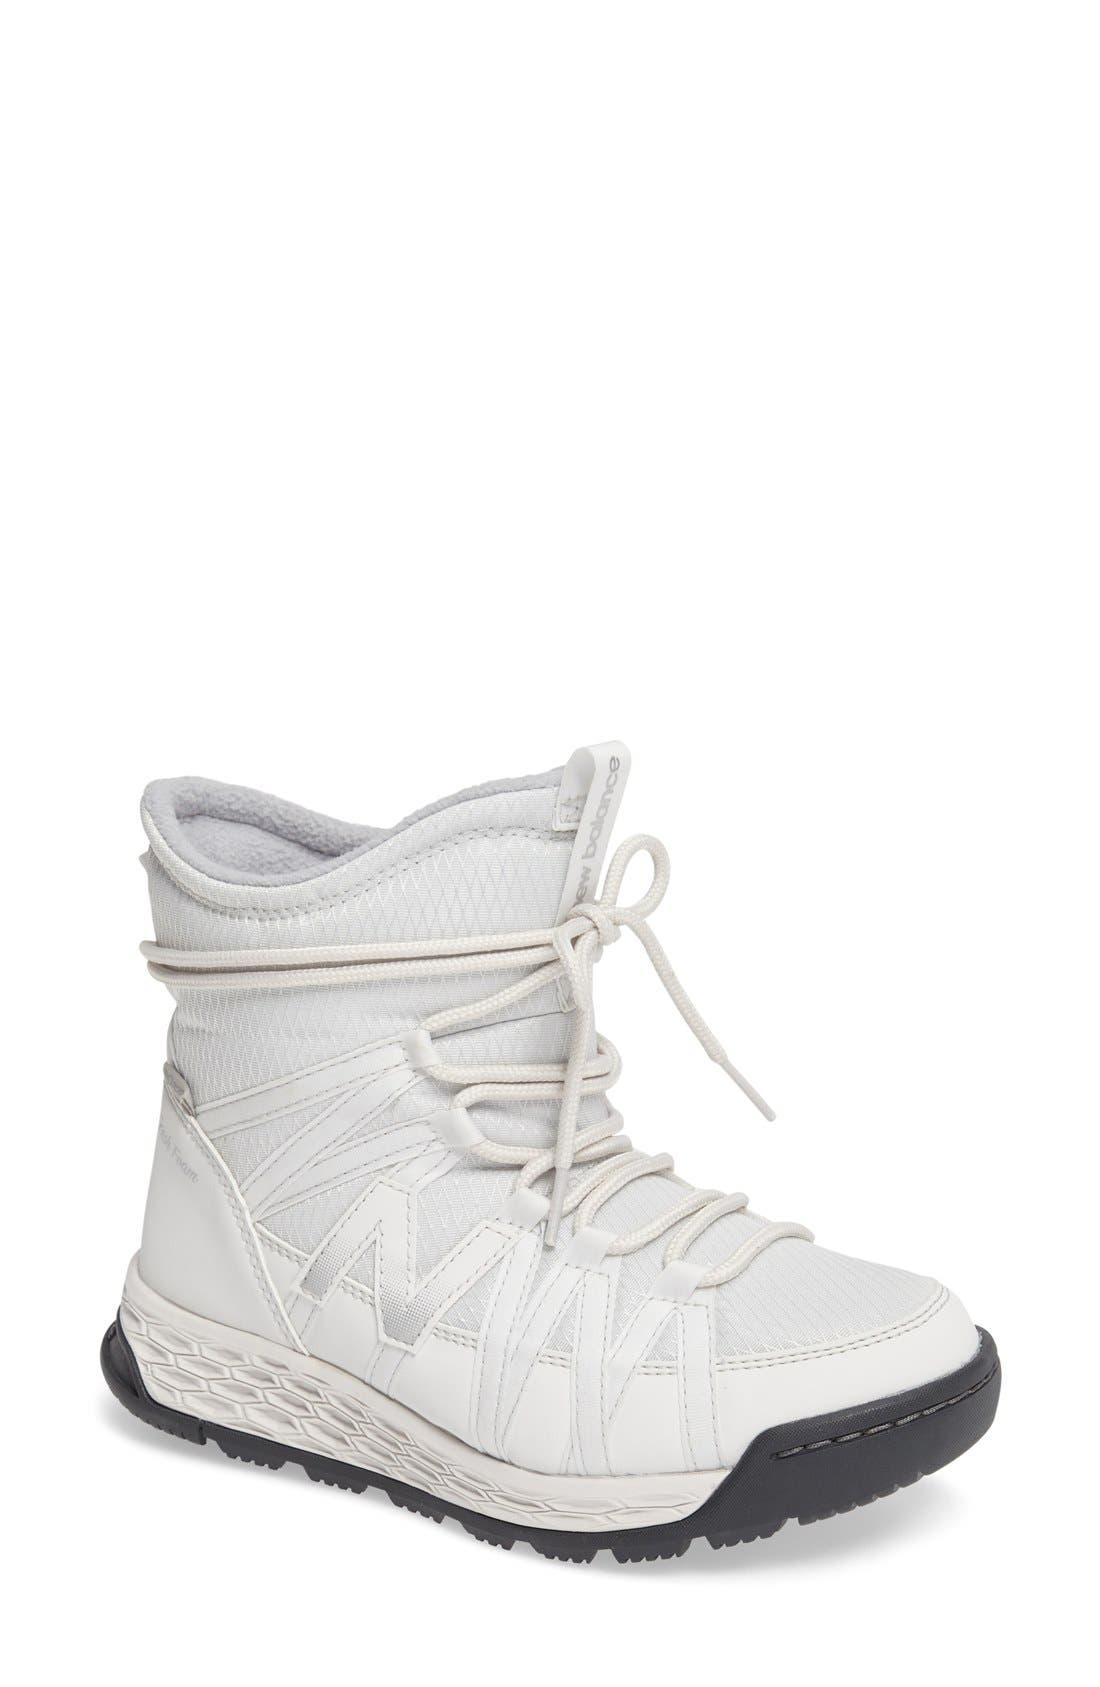 Q416 Weatherproof Snow Boot,                             Main thumbnail 1, color,                             White